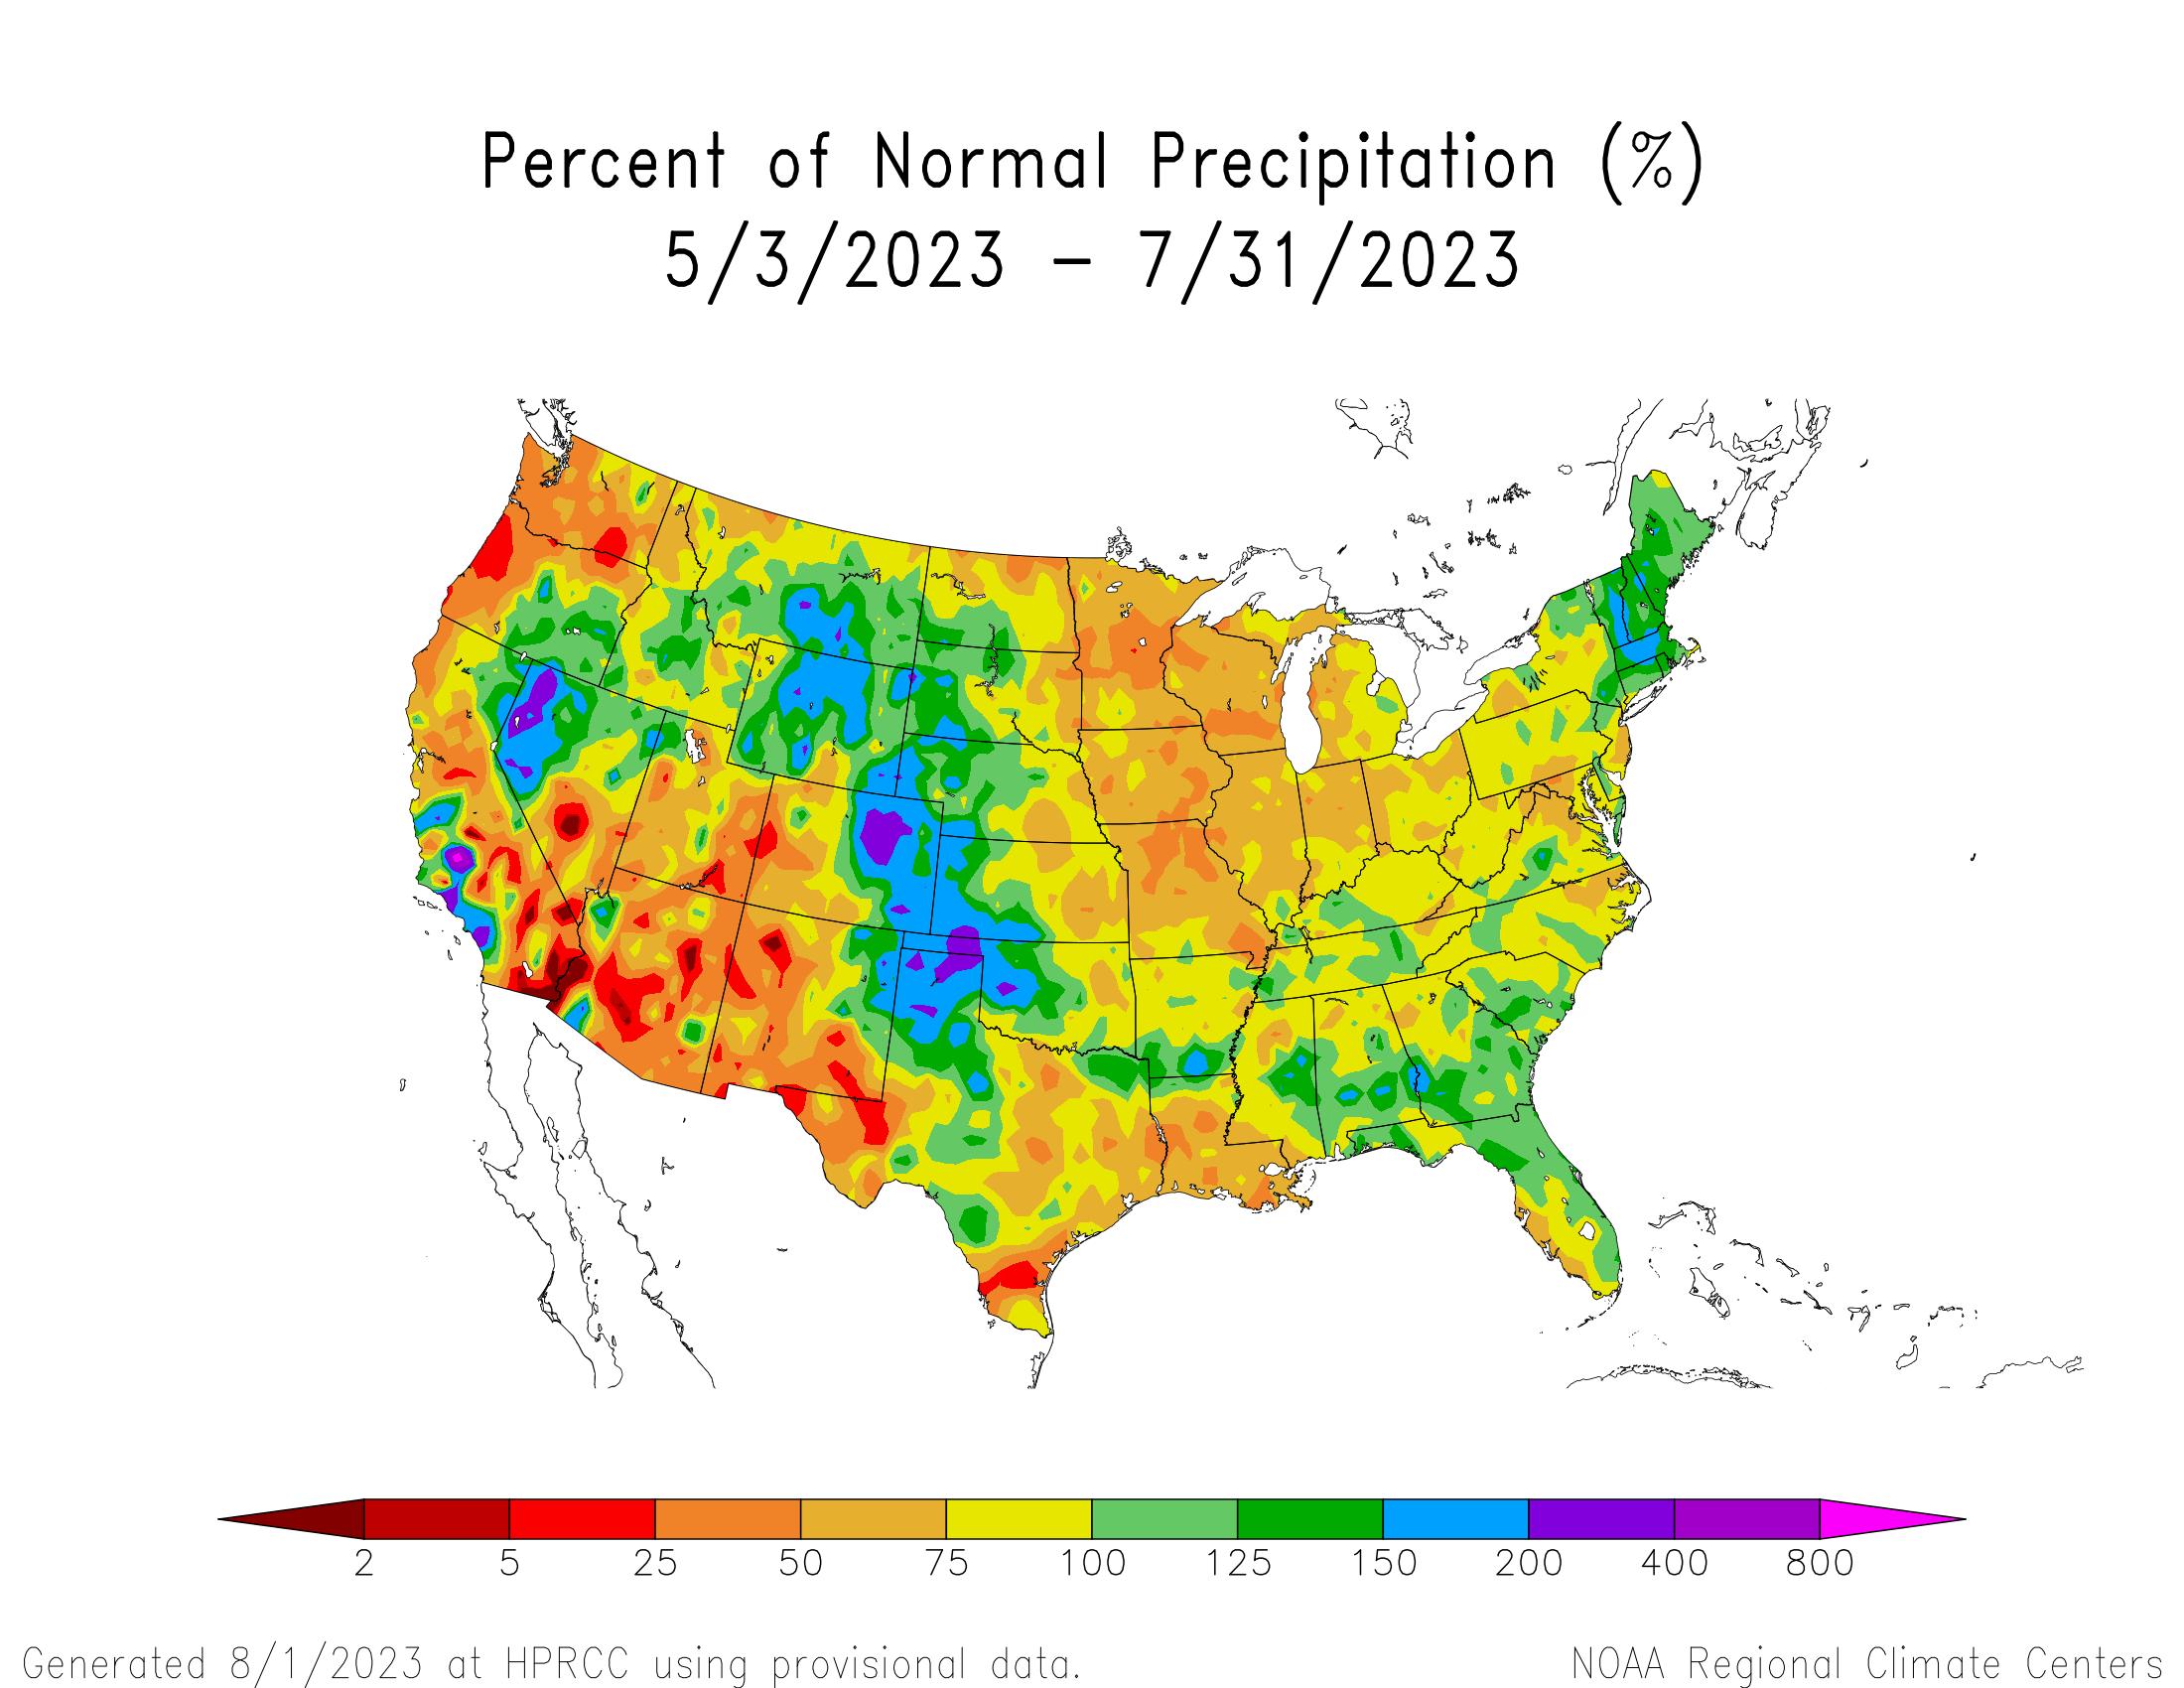 90-day Precipitation Percent of Normal